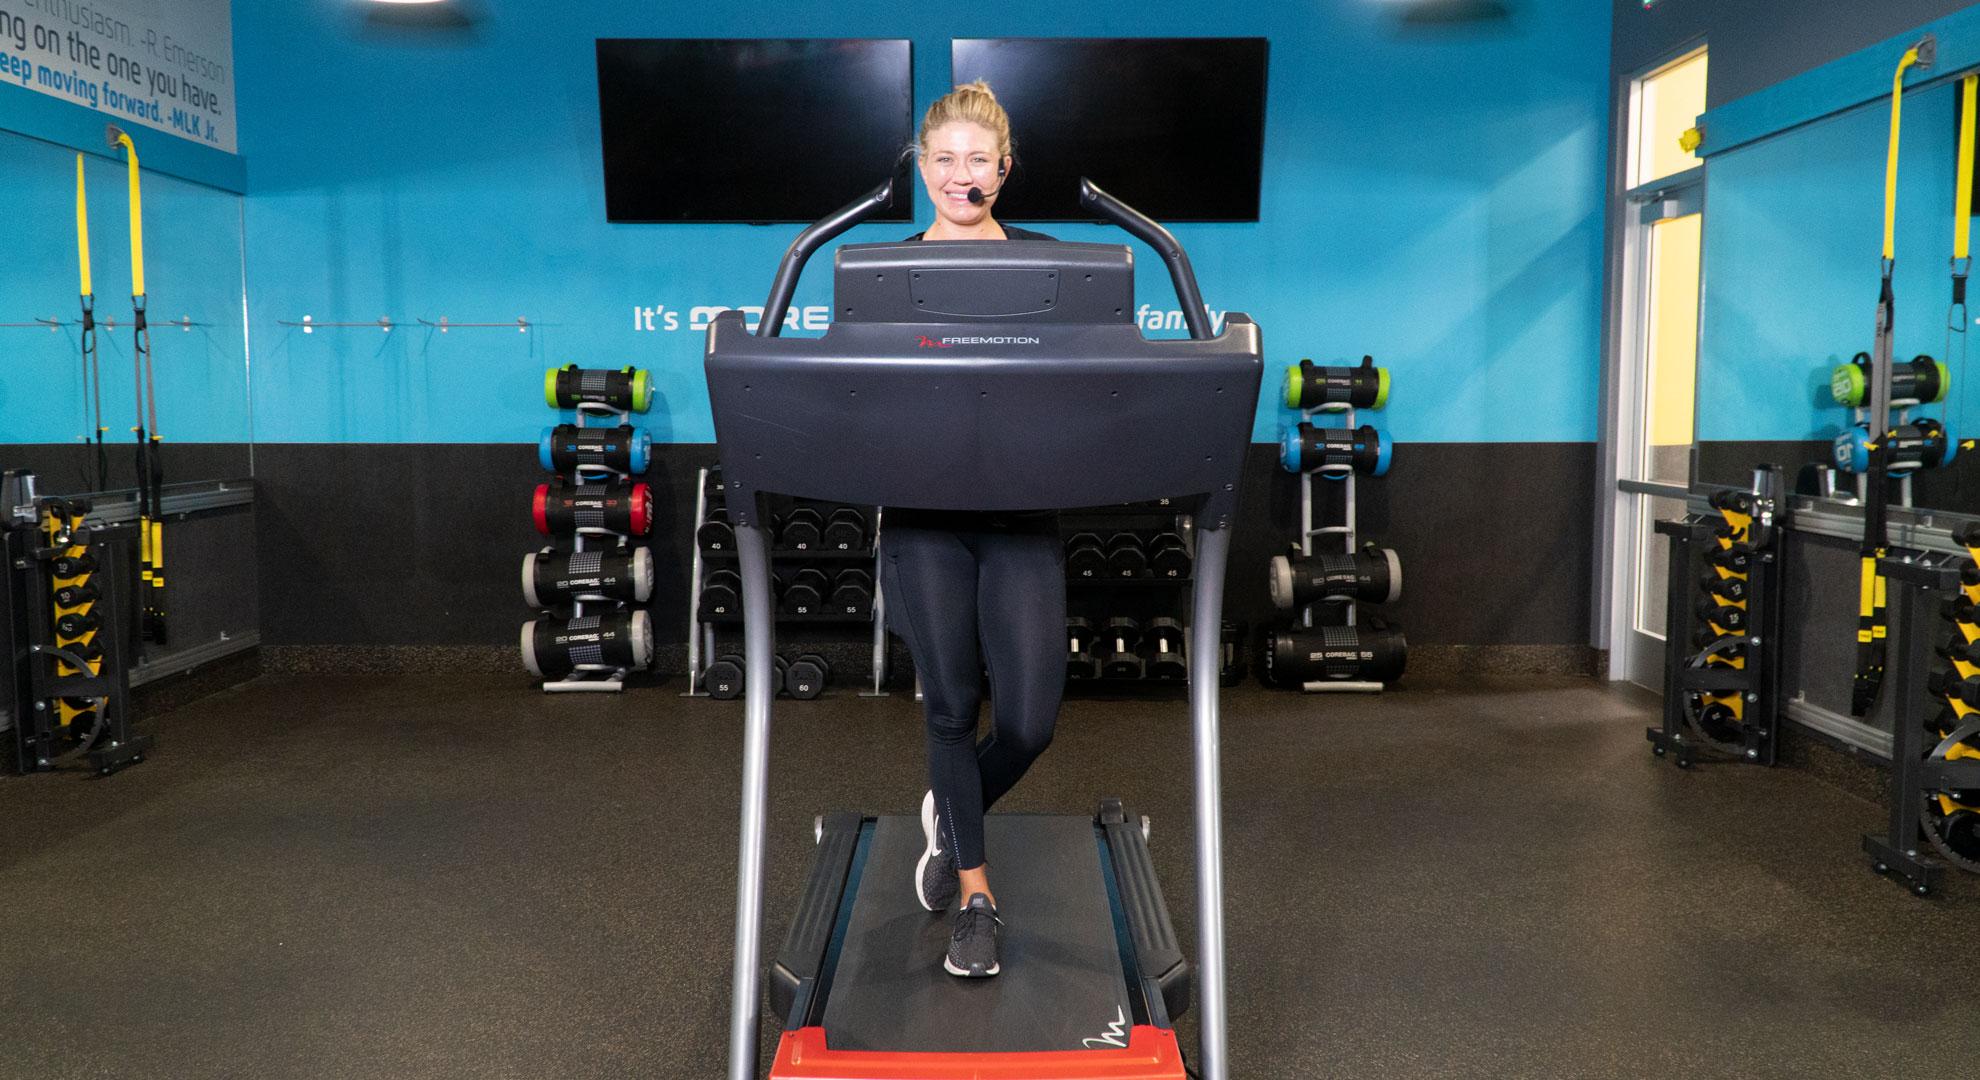 Coach Ashton teaching a treadmill HIIT class on iChuze Fitness